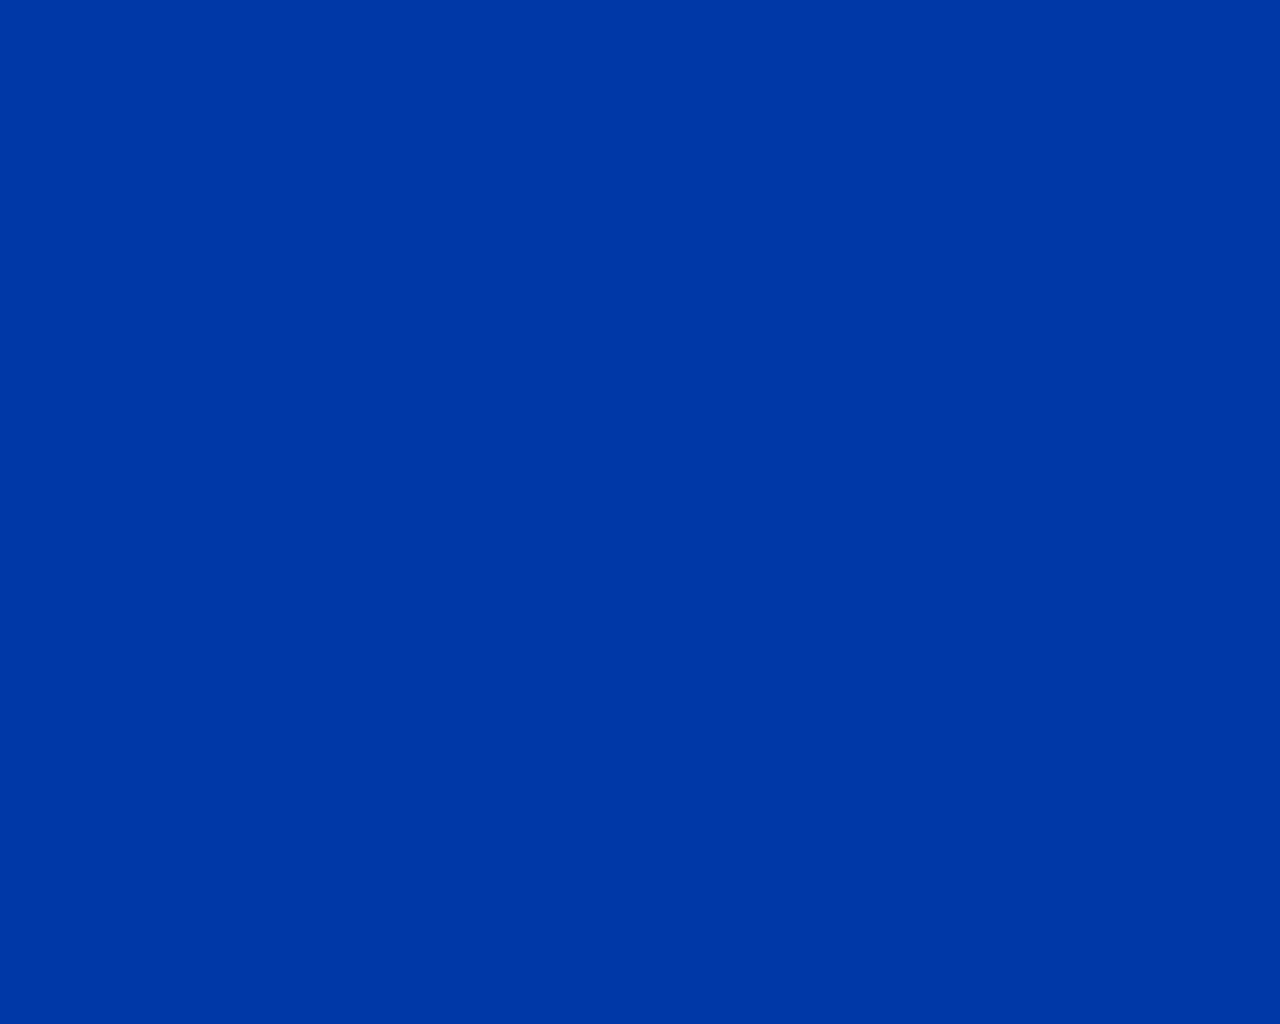 1280x1024 Royal Azure Solid Color Background